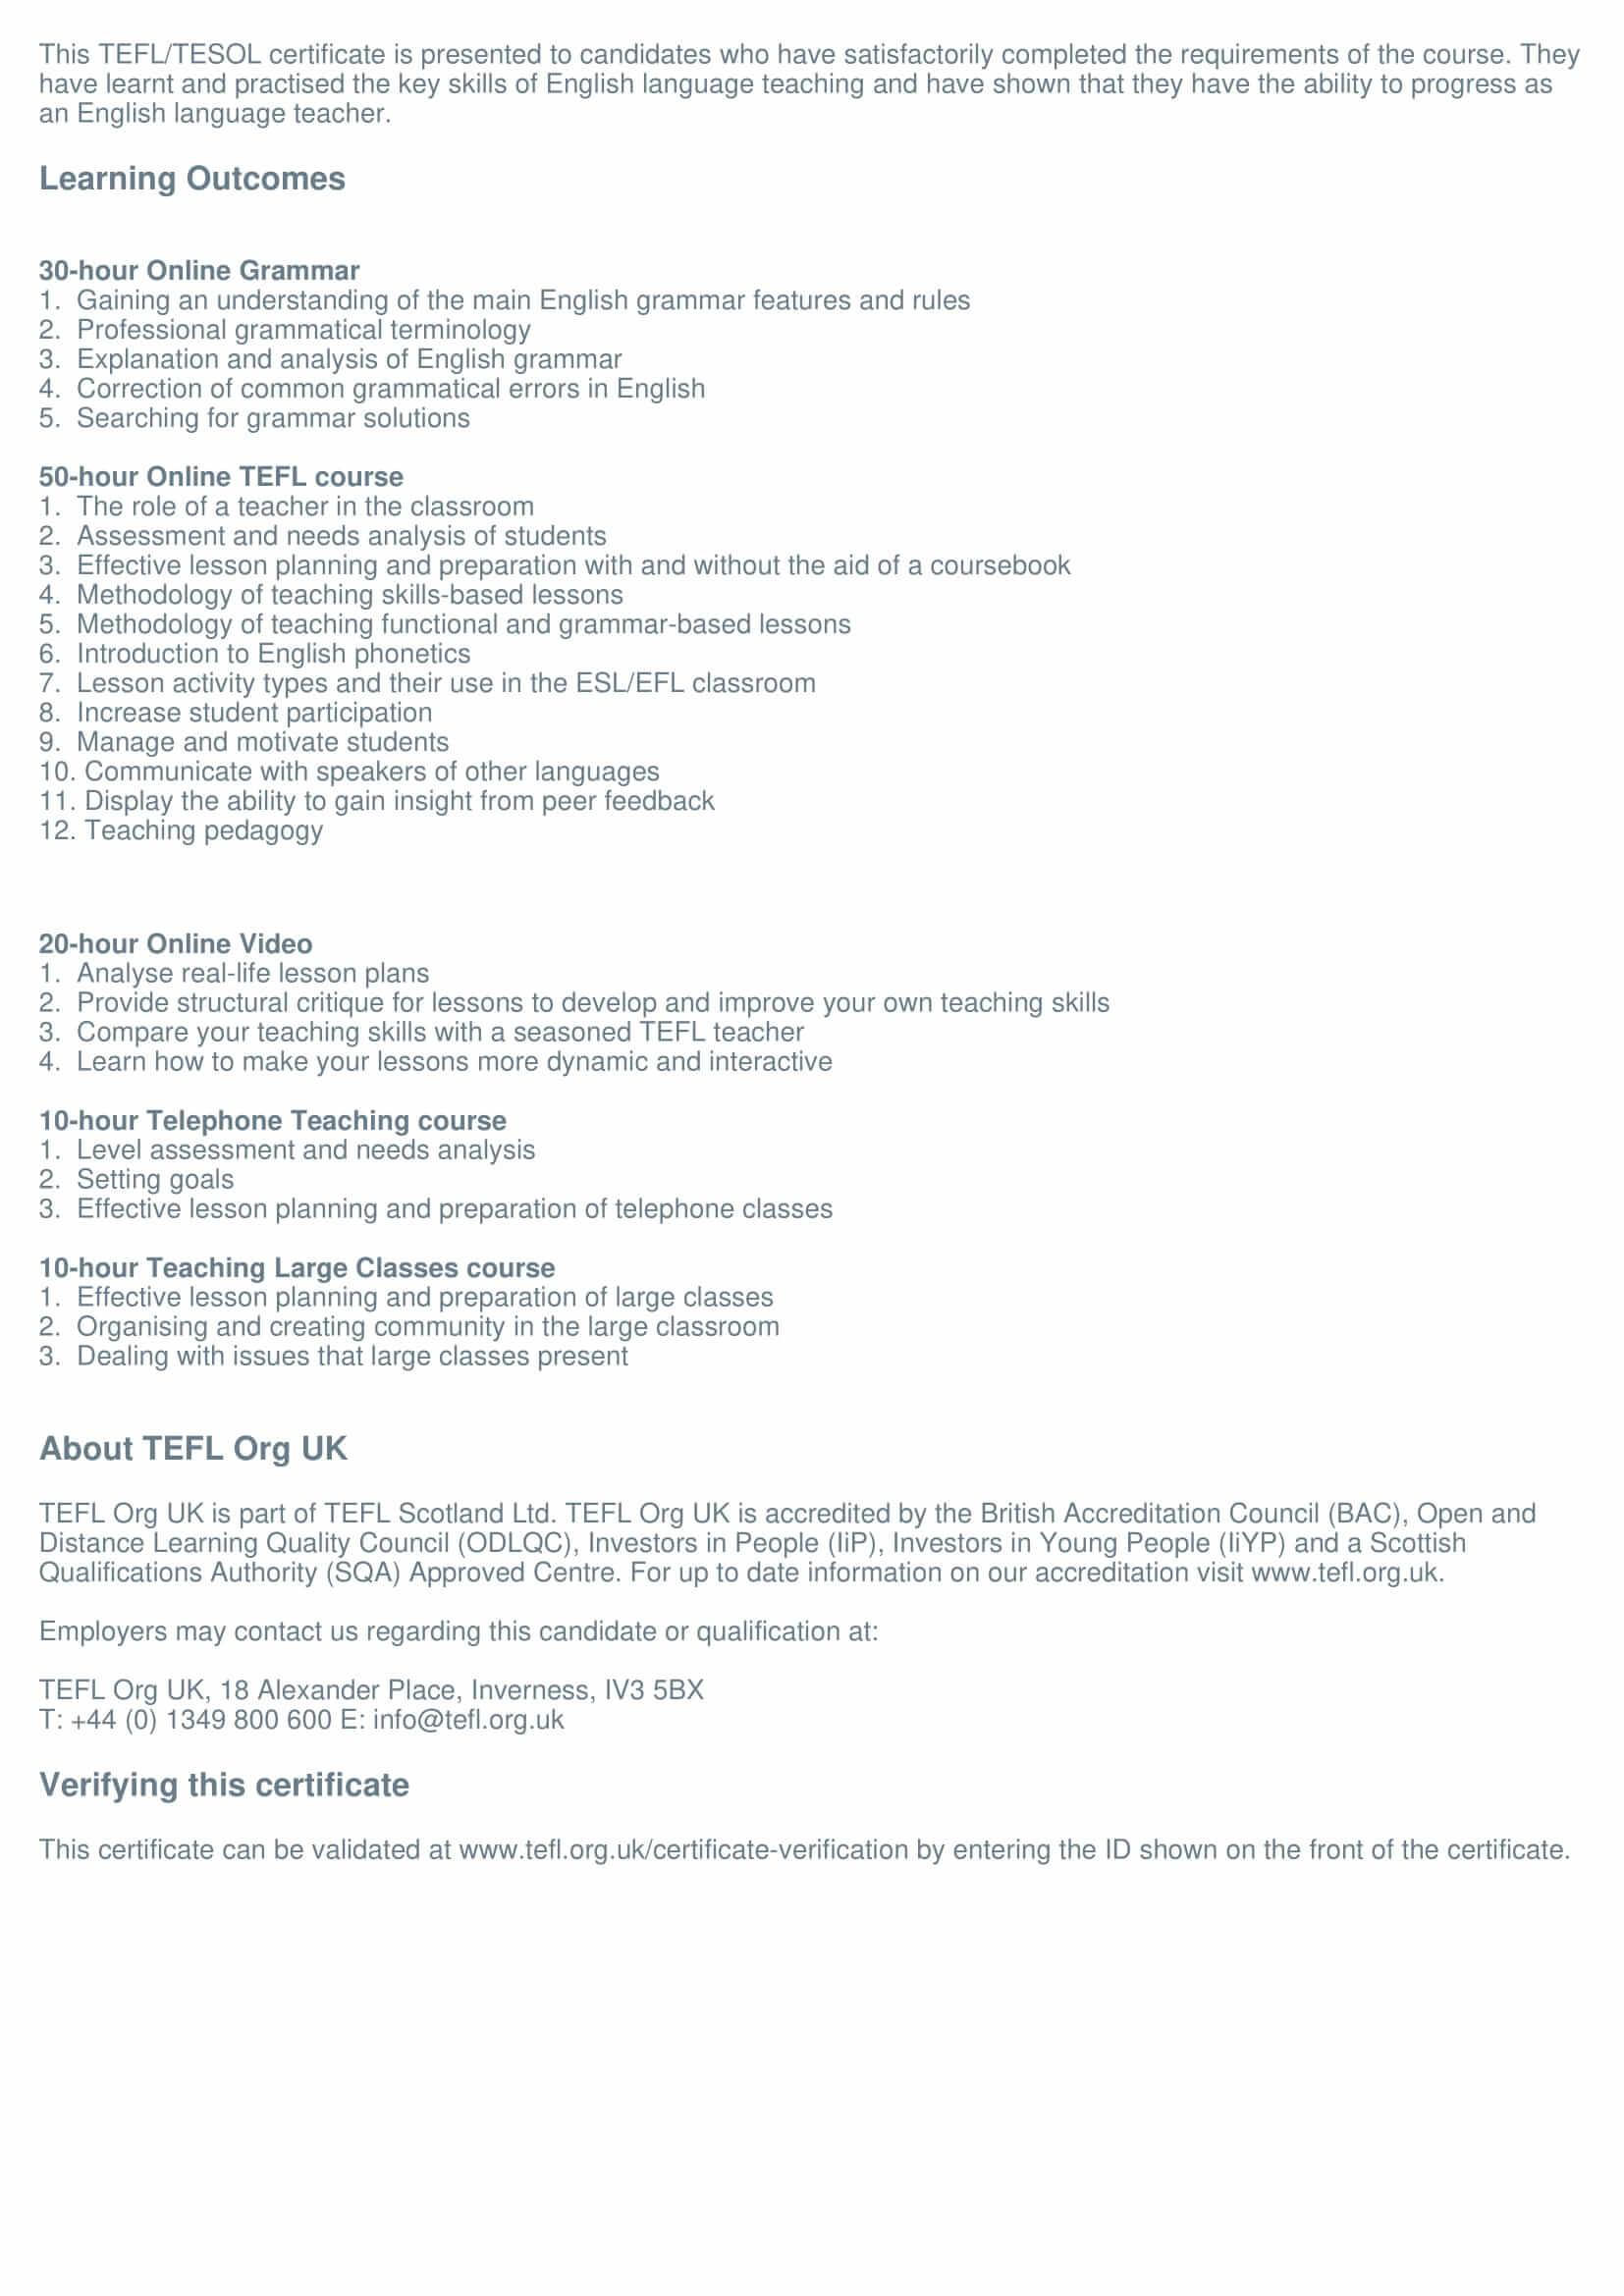 TEFL certification proof final 2